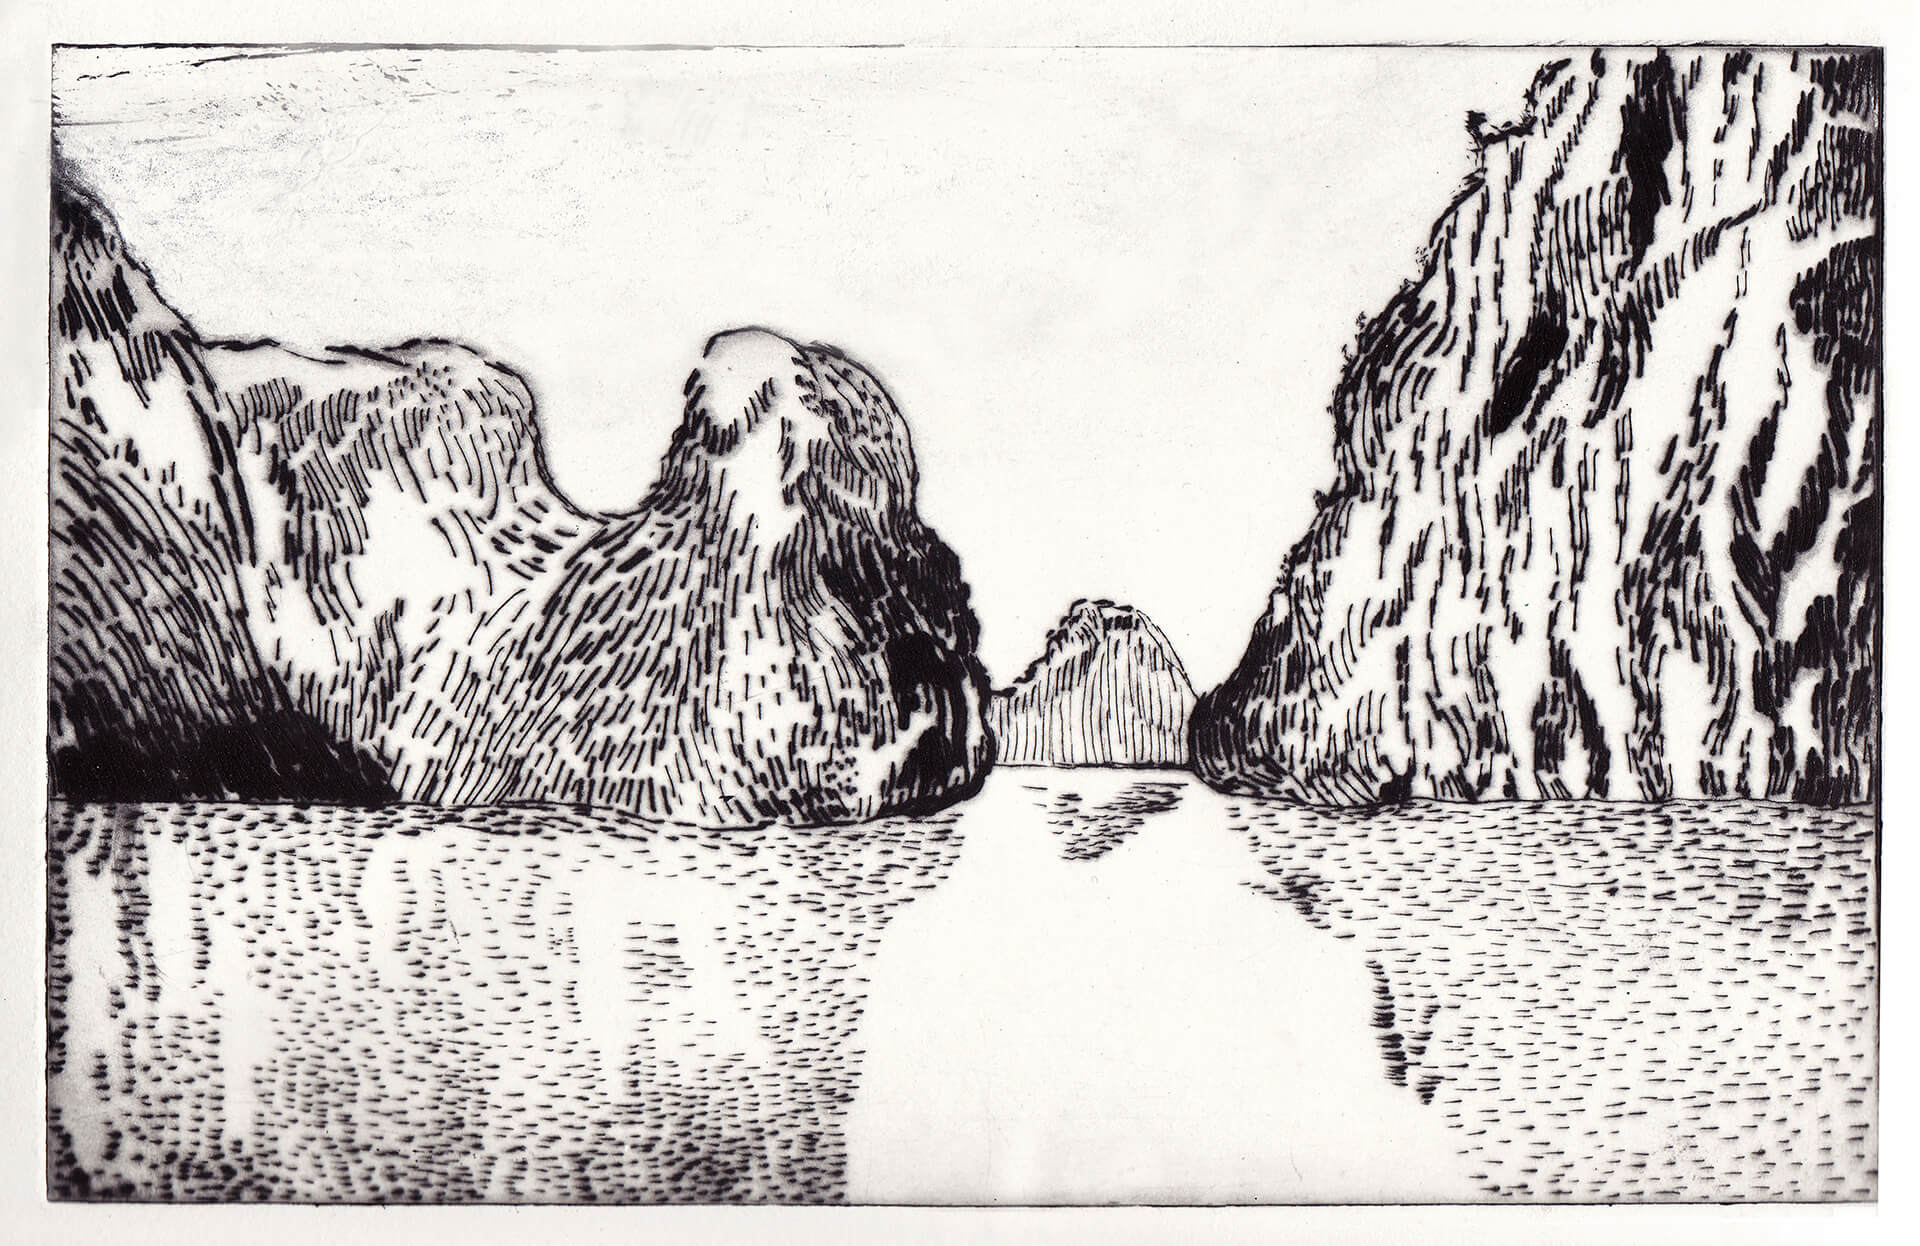 Ha long bay gravure pointe seche christine cabirol 2016